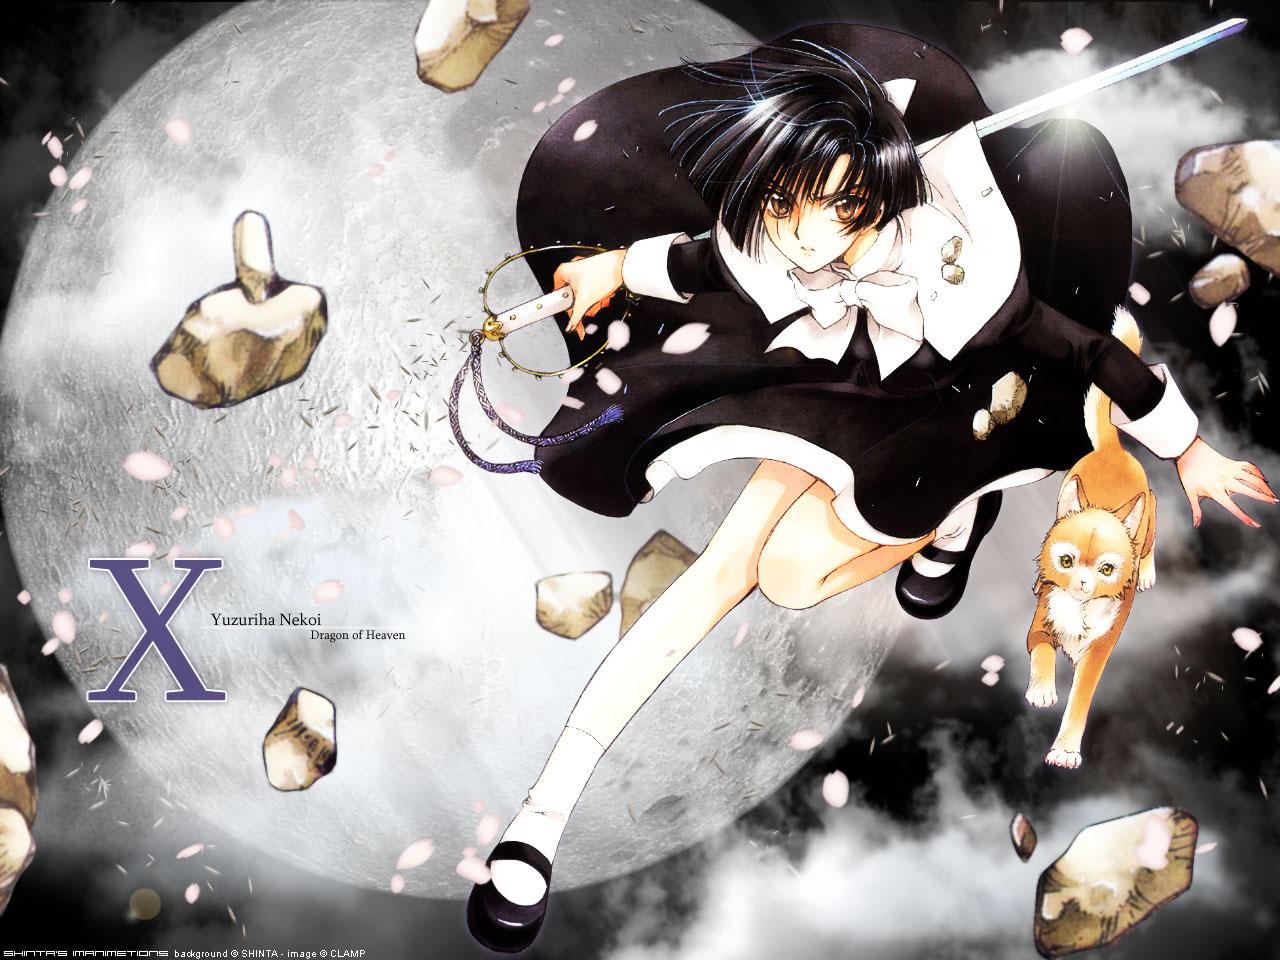 animal black_hair bow cat clamp clouds dress inuki moon nekoi_yuzuriha night orange_eyes petals planet short_hair sky sword watermark weapon x yellow_eyes